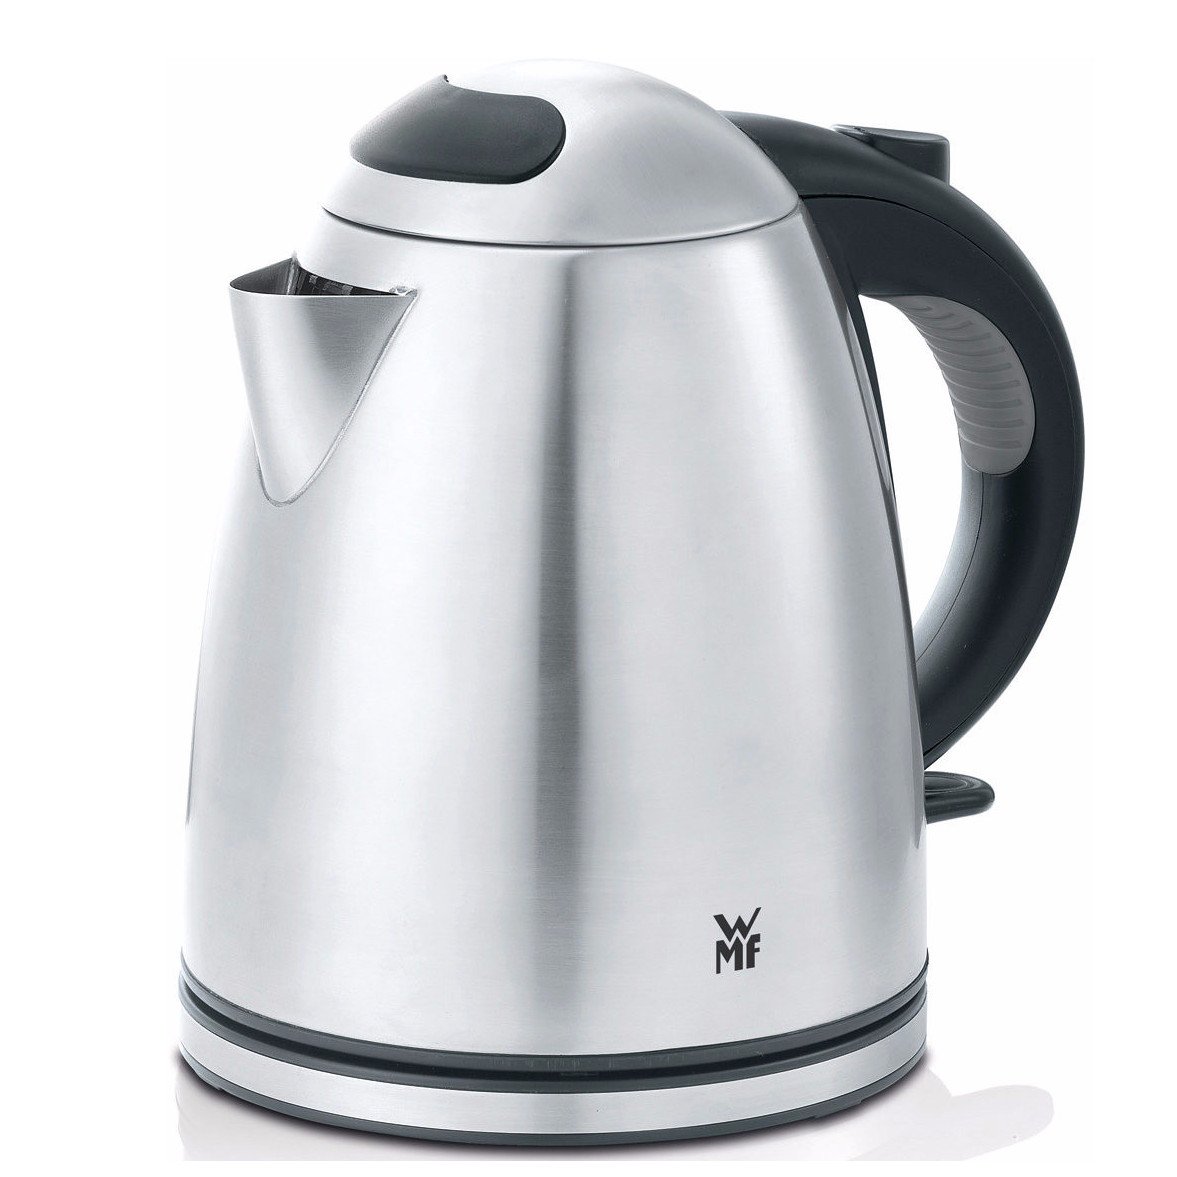 WMF STELIO 不锈钢电热水壶